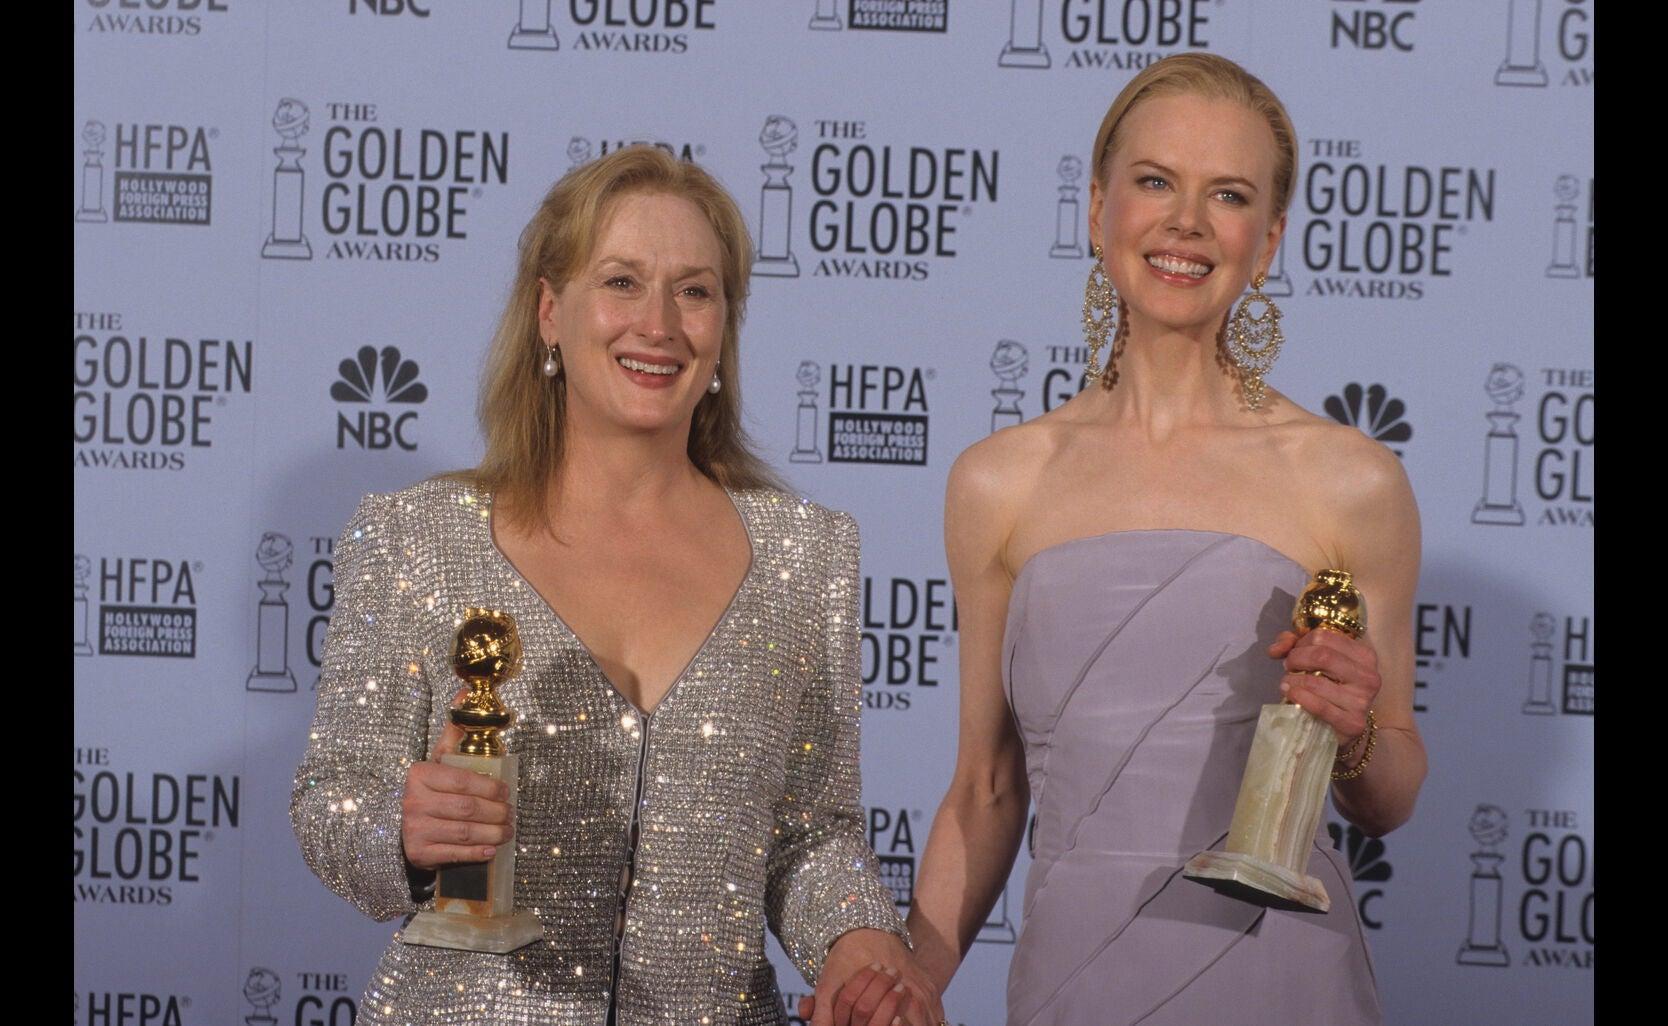 Actress Meryl Streep, Golden Globe winner, in 2003, with Nicole Kidman, Golden Globe winner